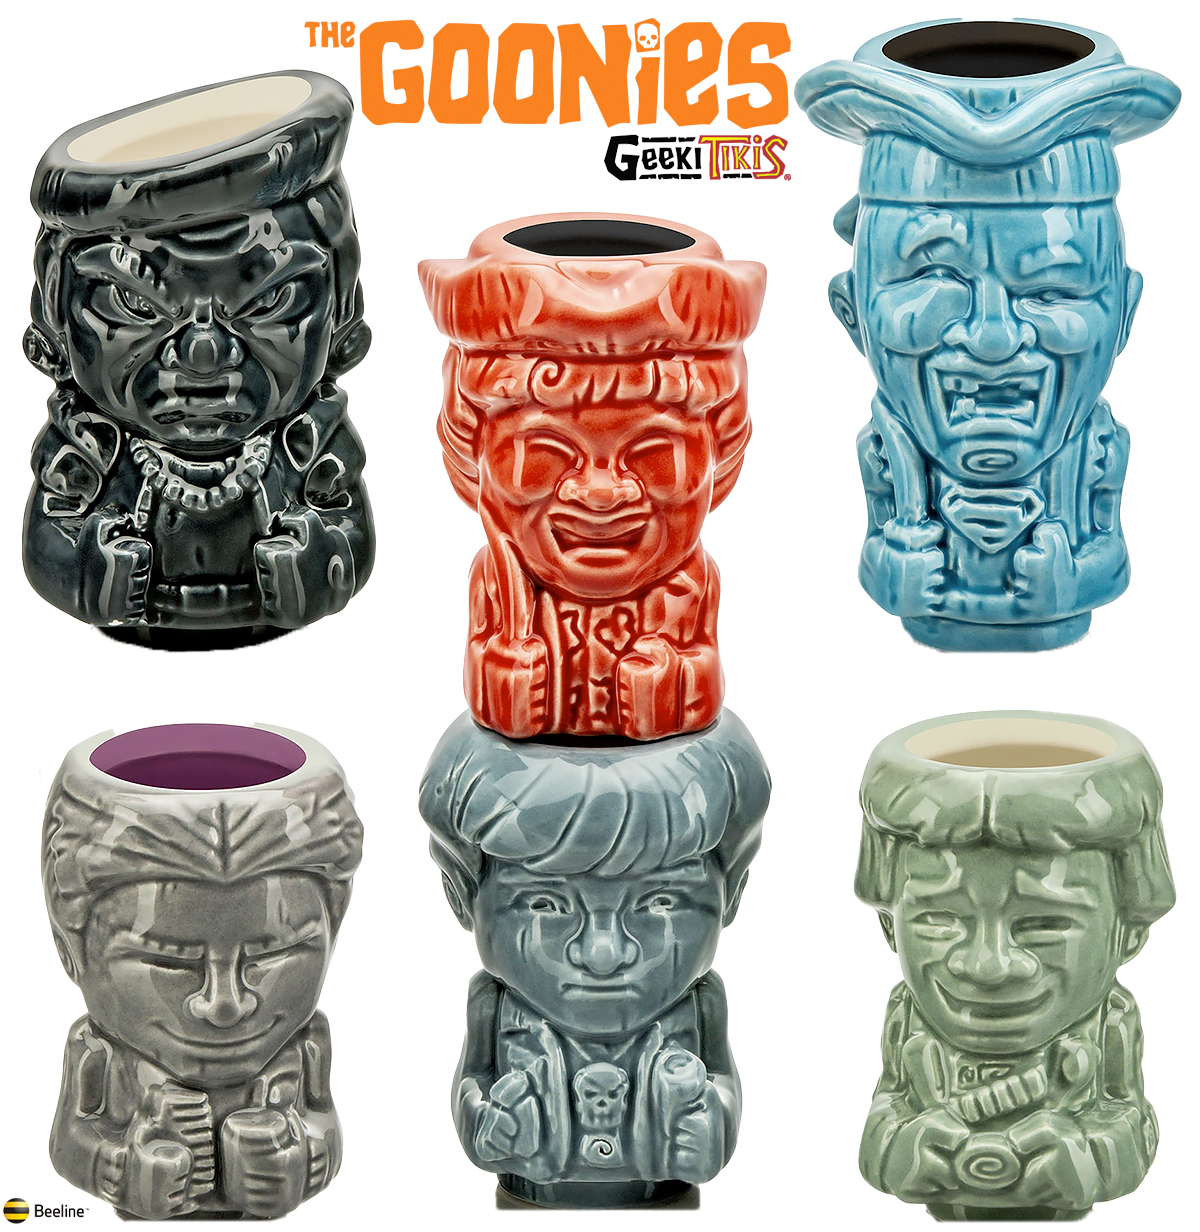 Mini-Canecas Os Goonies Geeki Tikis: Mikey, Dado, Gordo, Bocão, Sloth e Mama Fratelli